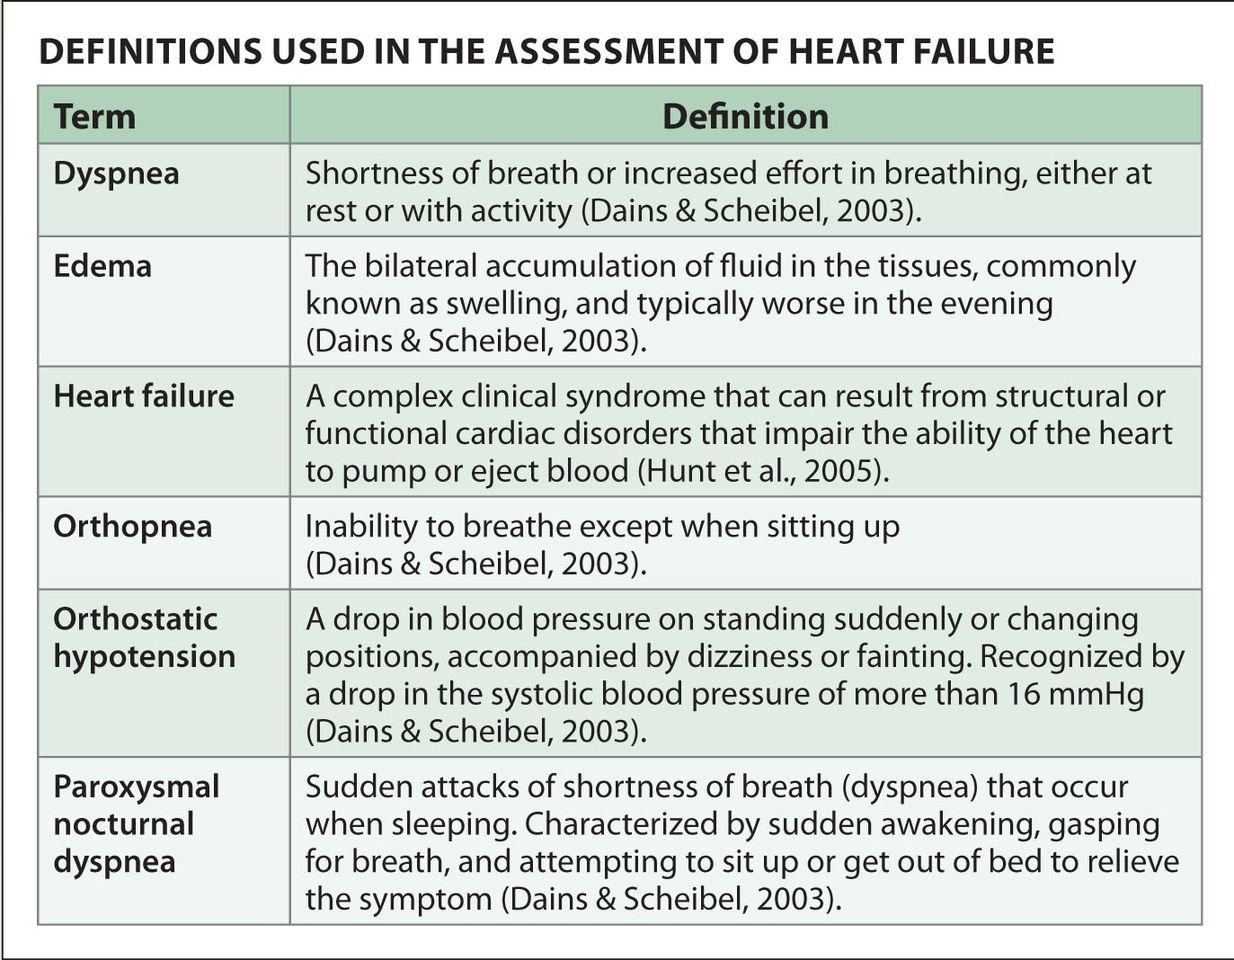 triampur compositum magas vérnyomás esetén köles zabkása magas vérnyomás ellen